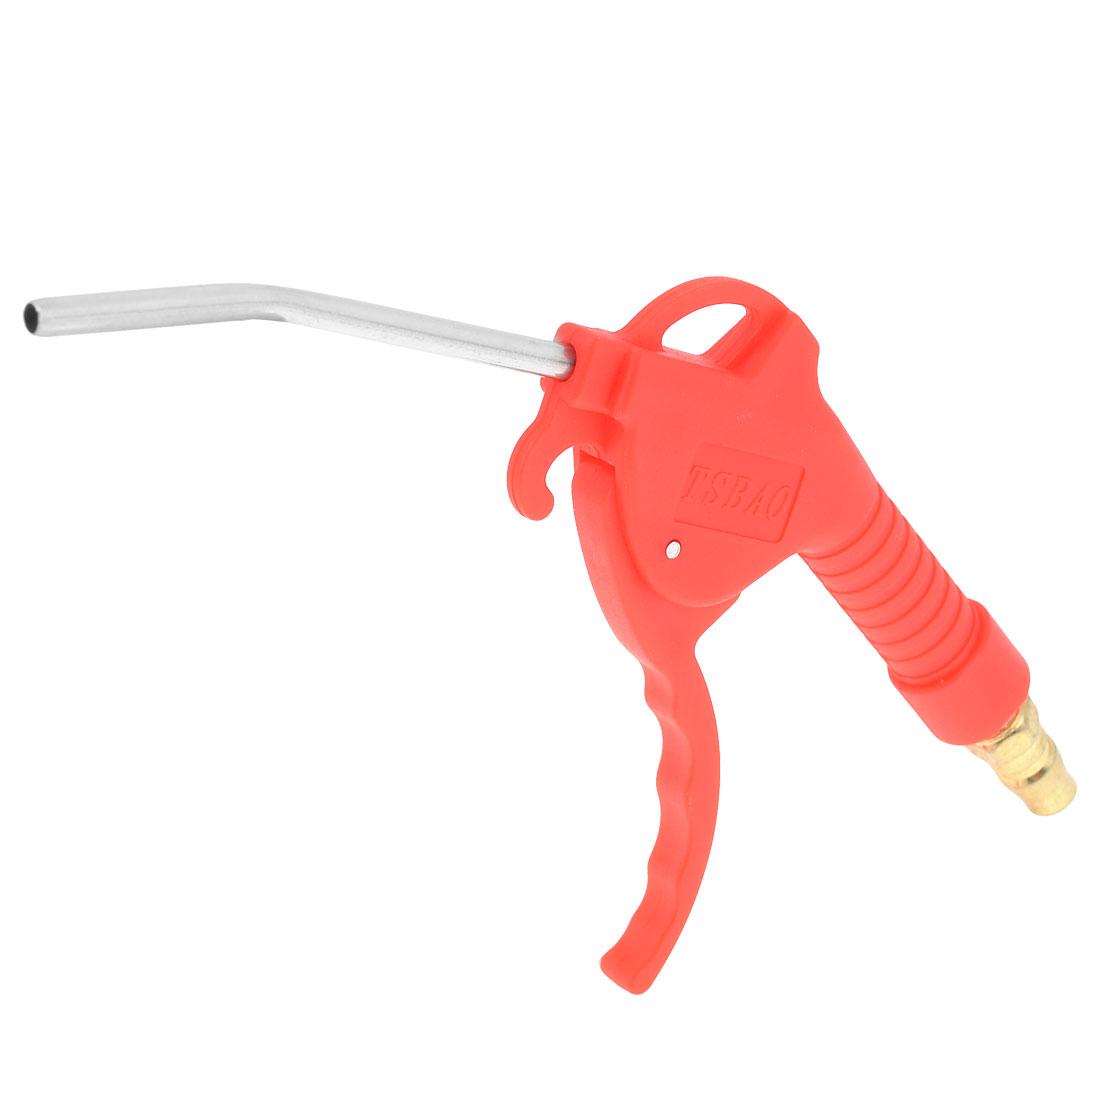 "Pneumatic Tool 3.9"" Long Curved Tip Nozzle High Pressure Air Blow Dust Gun"